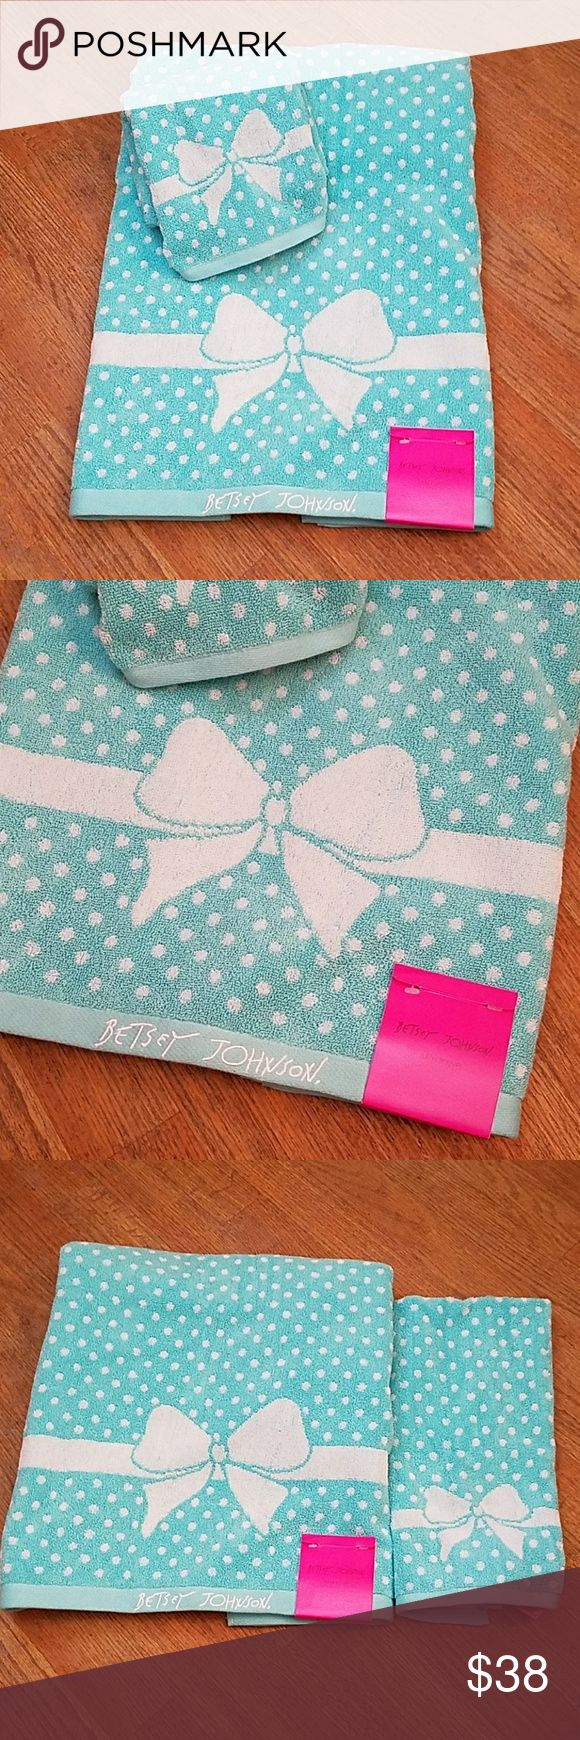 best 25+ soft towels ideas on pinterest | towels, bathroom towels